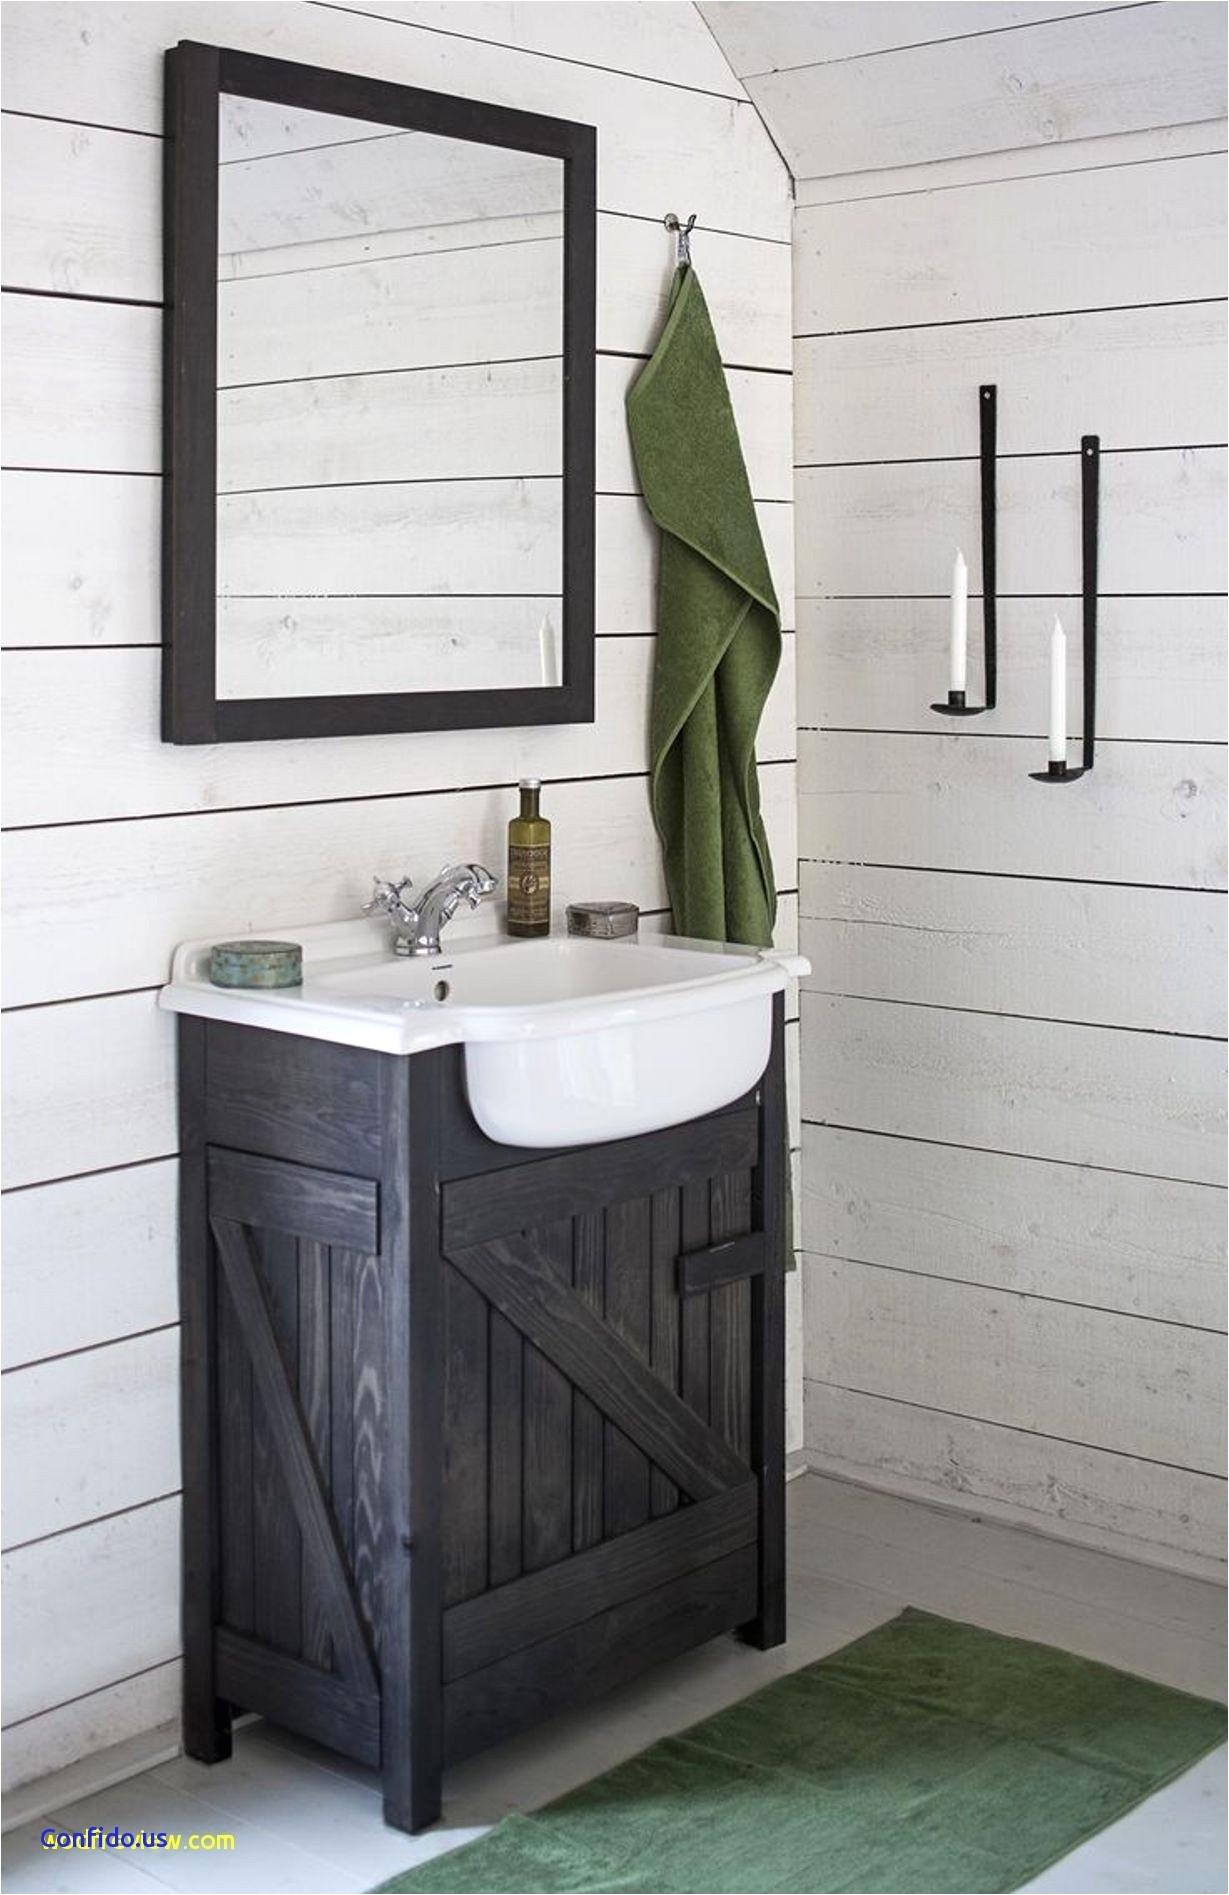 54×27 Bathtub Lovely 54a—27 Bathtub Amukraine